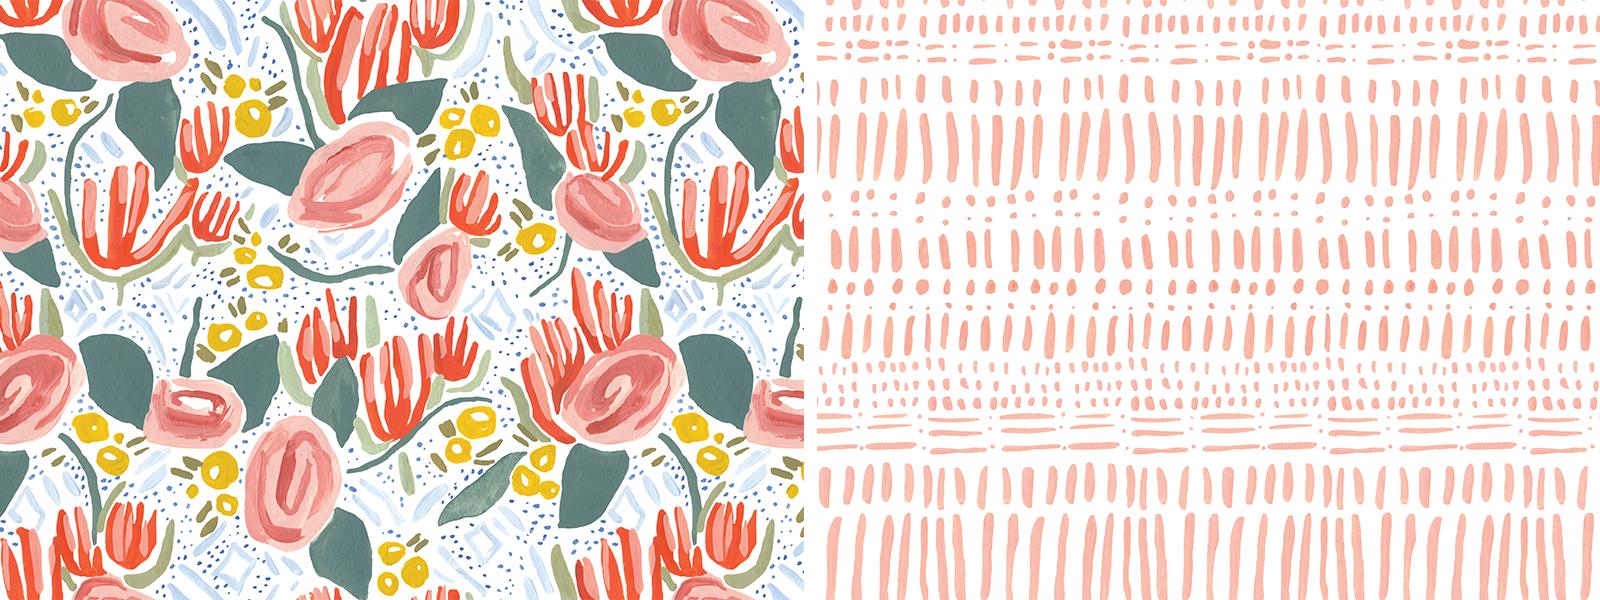 Pattern_9_Margaret-Jeane.png